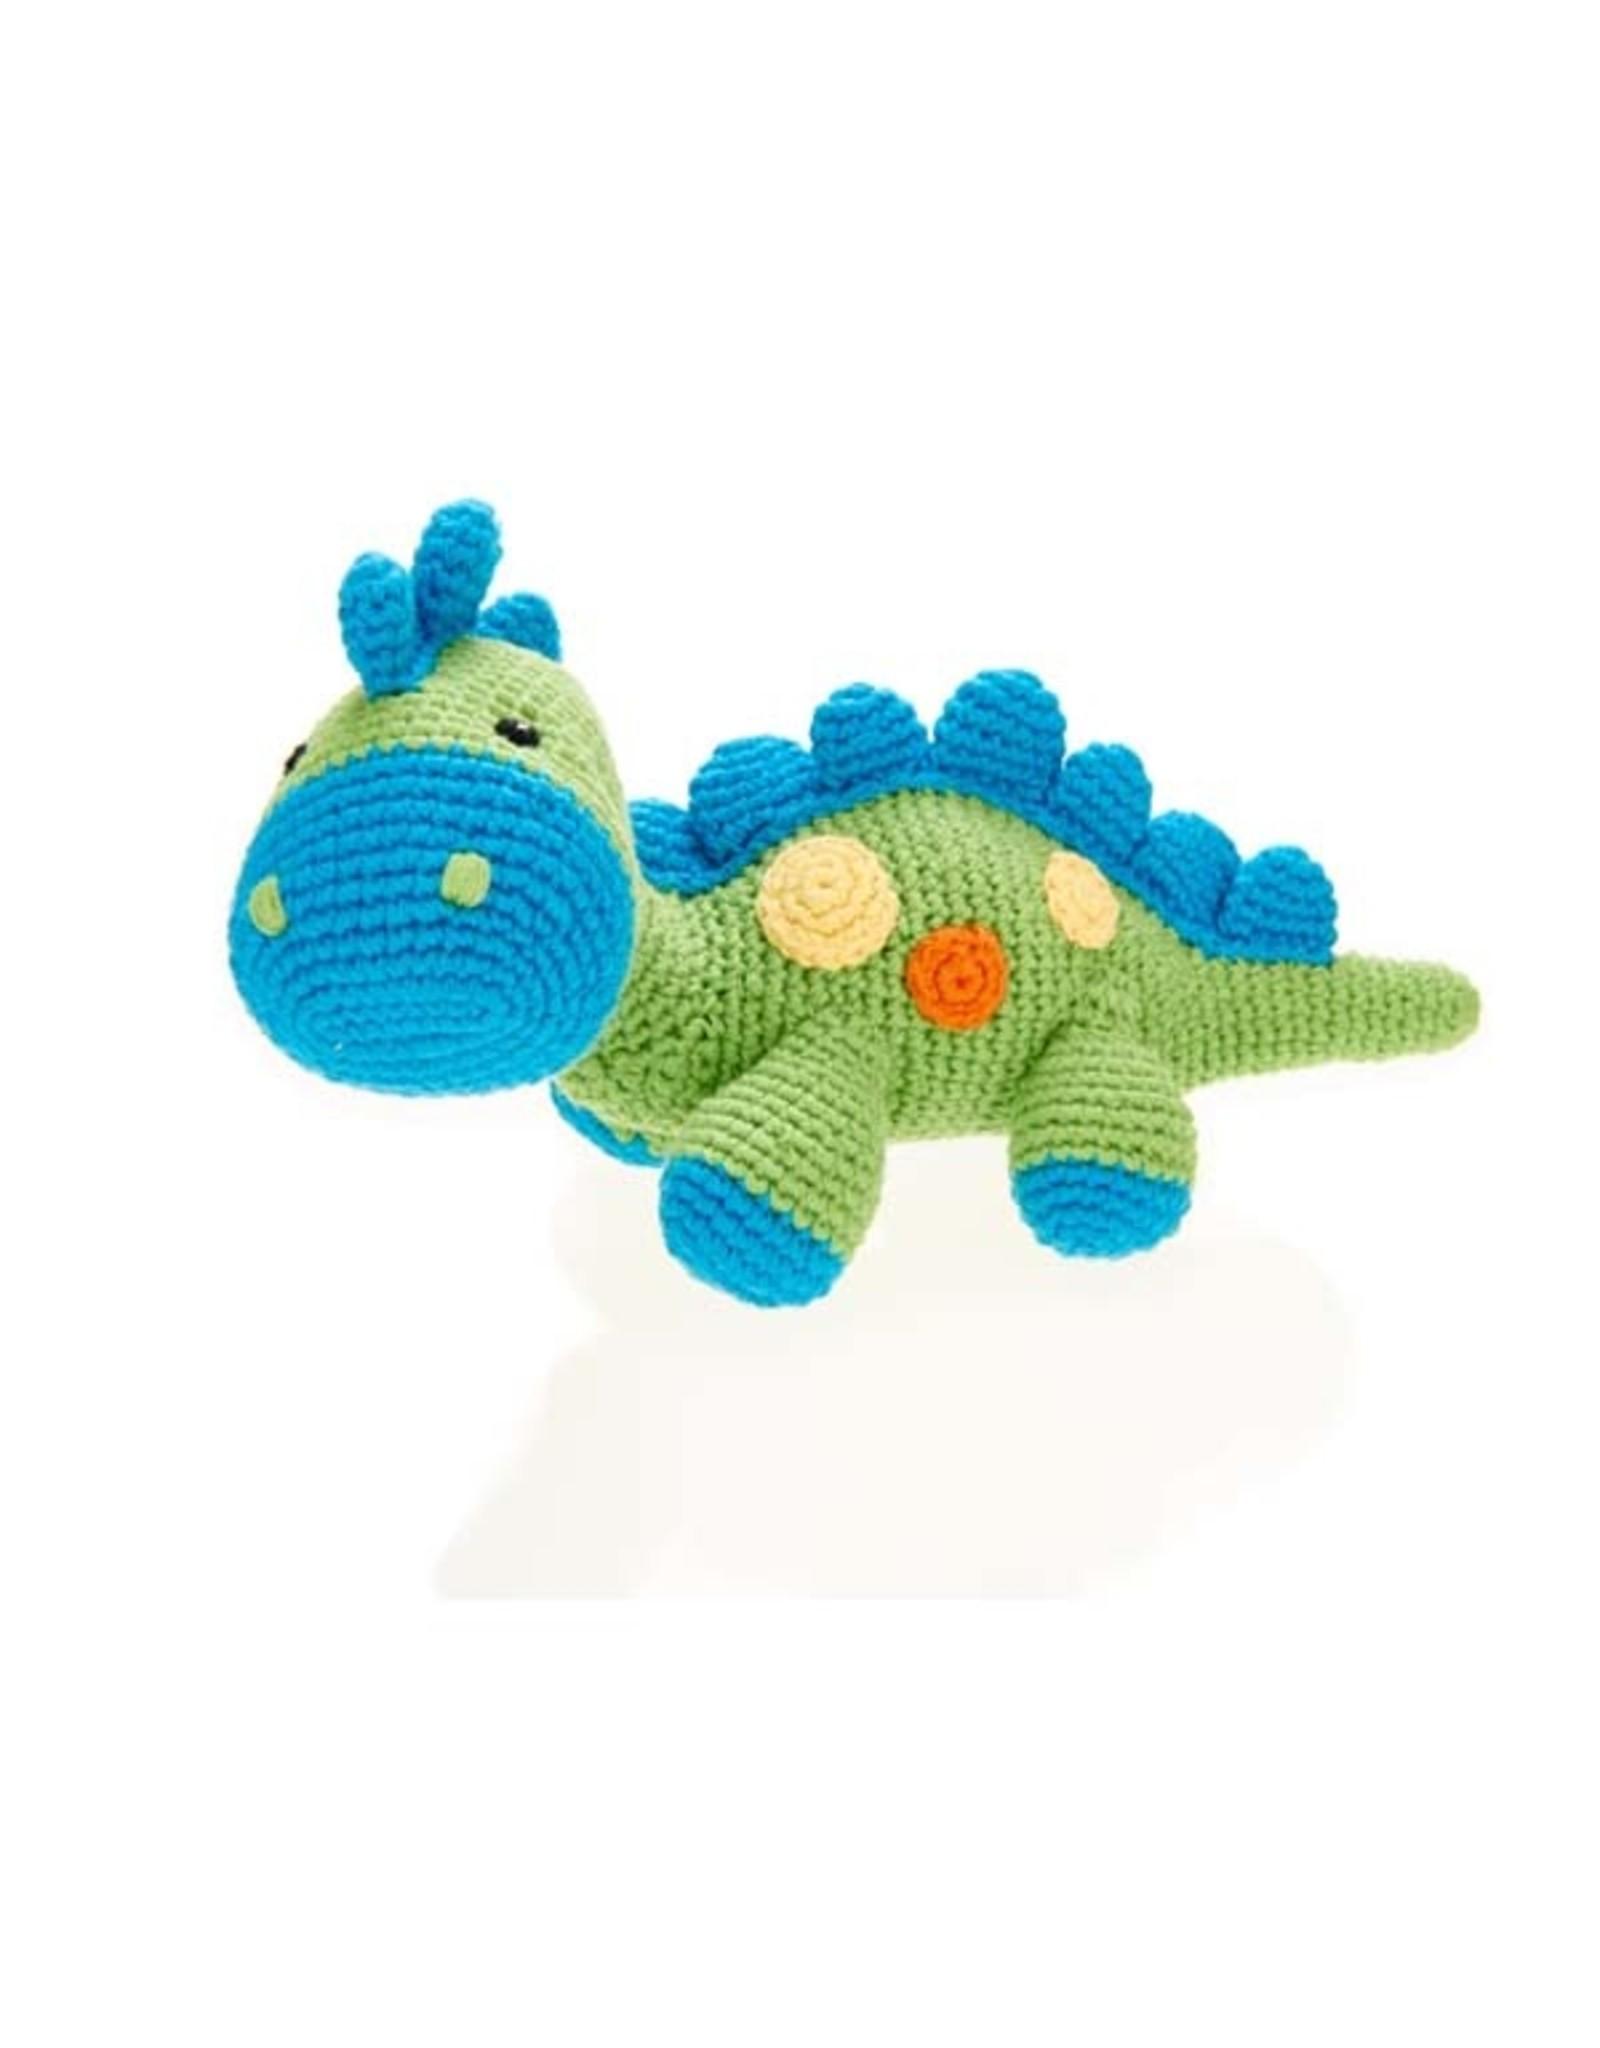 Dinosaur Rattle - Steggy - Green